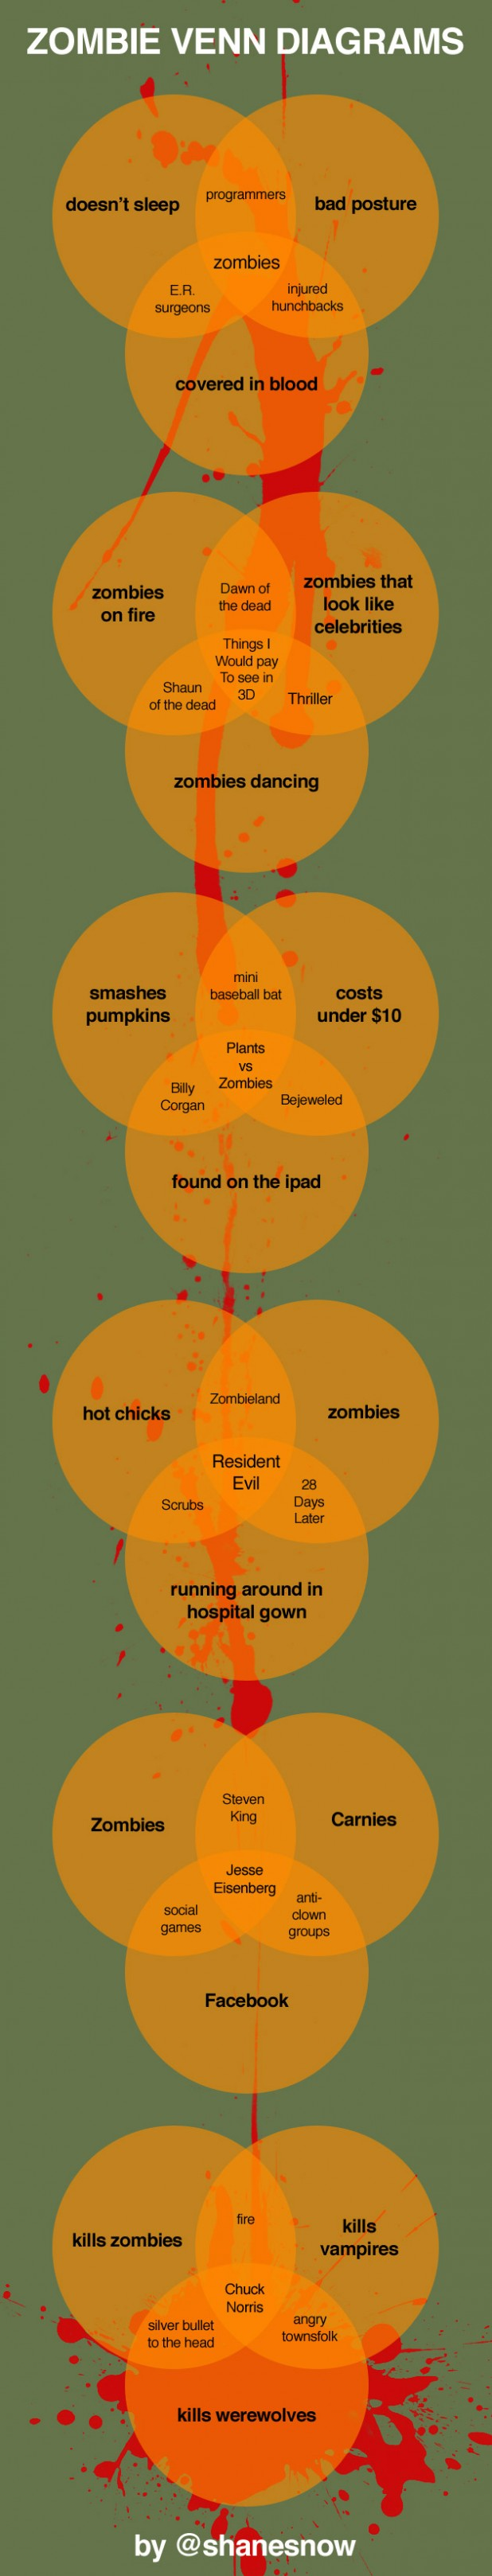 zombie-venn-diagrams